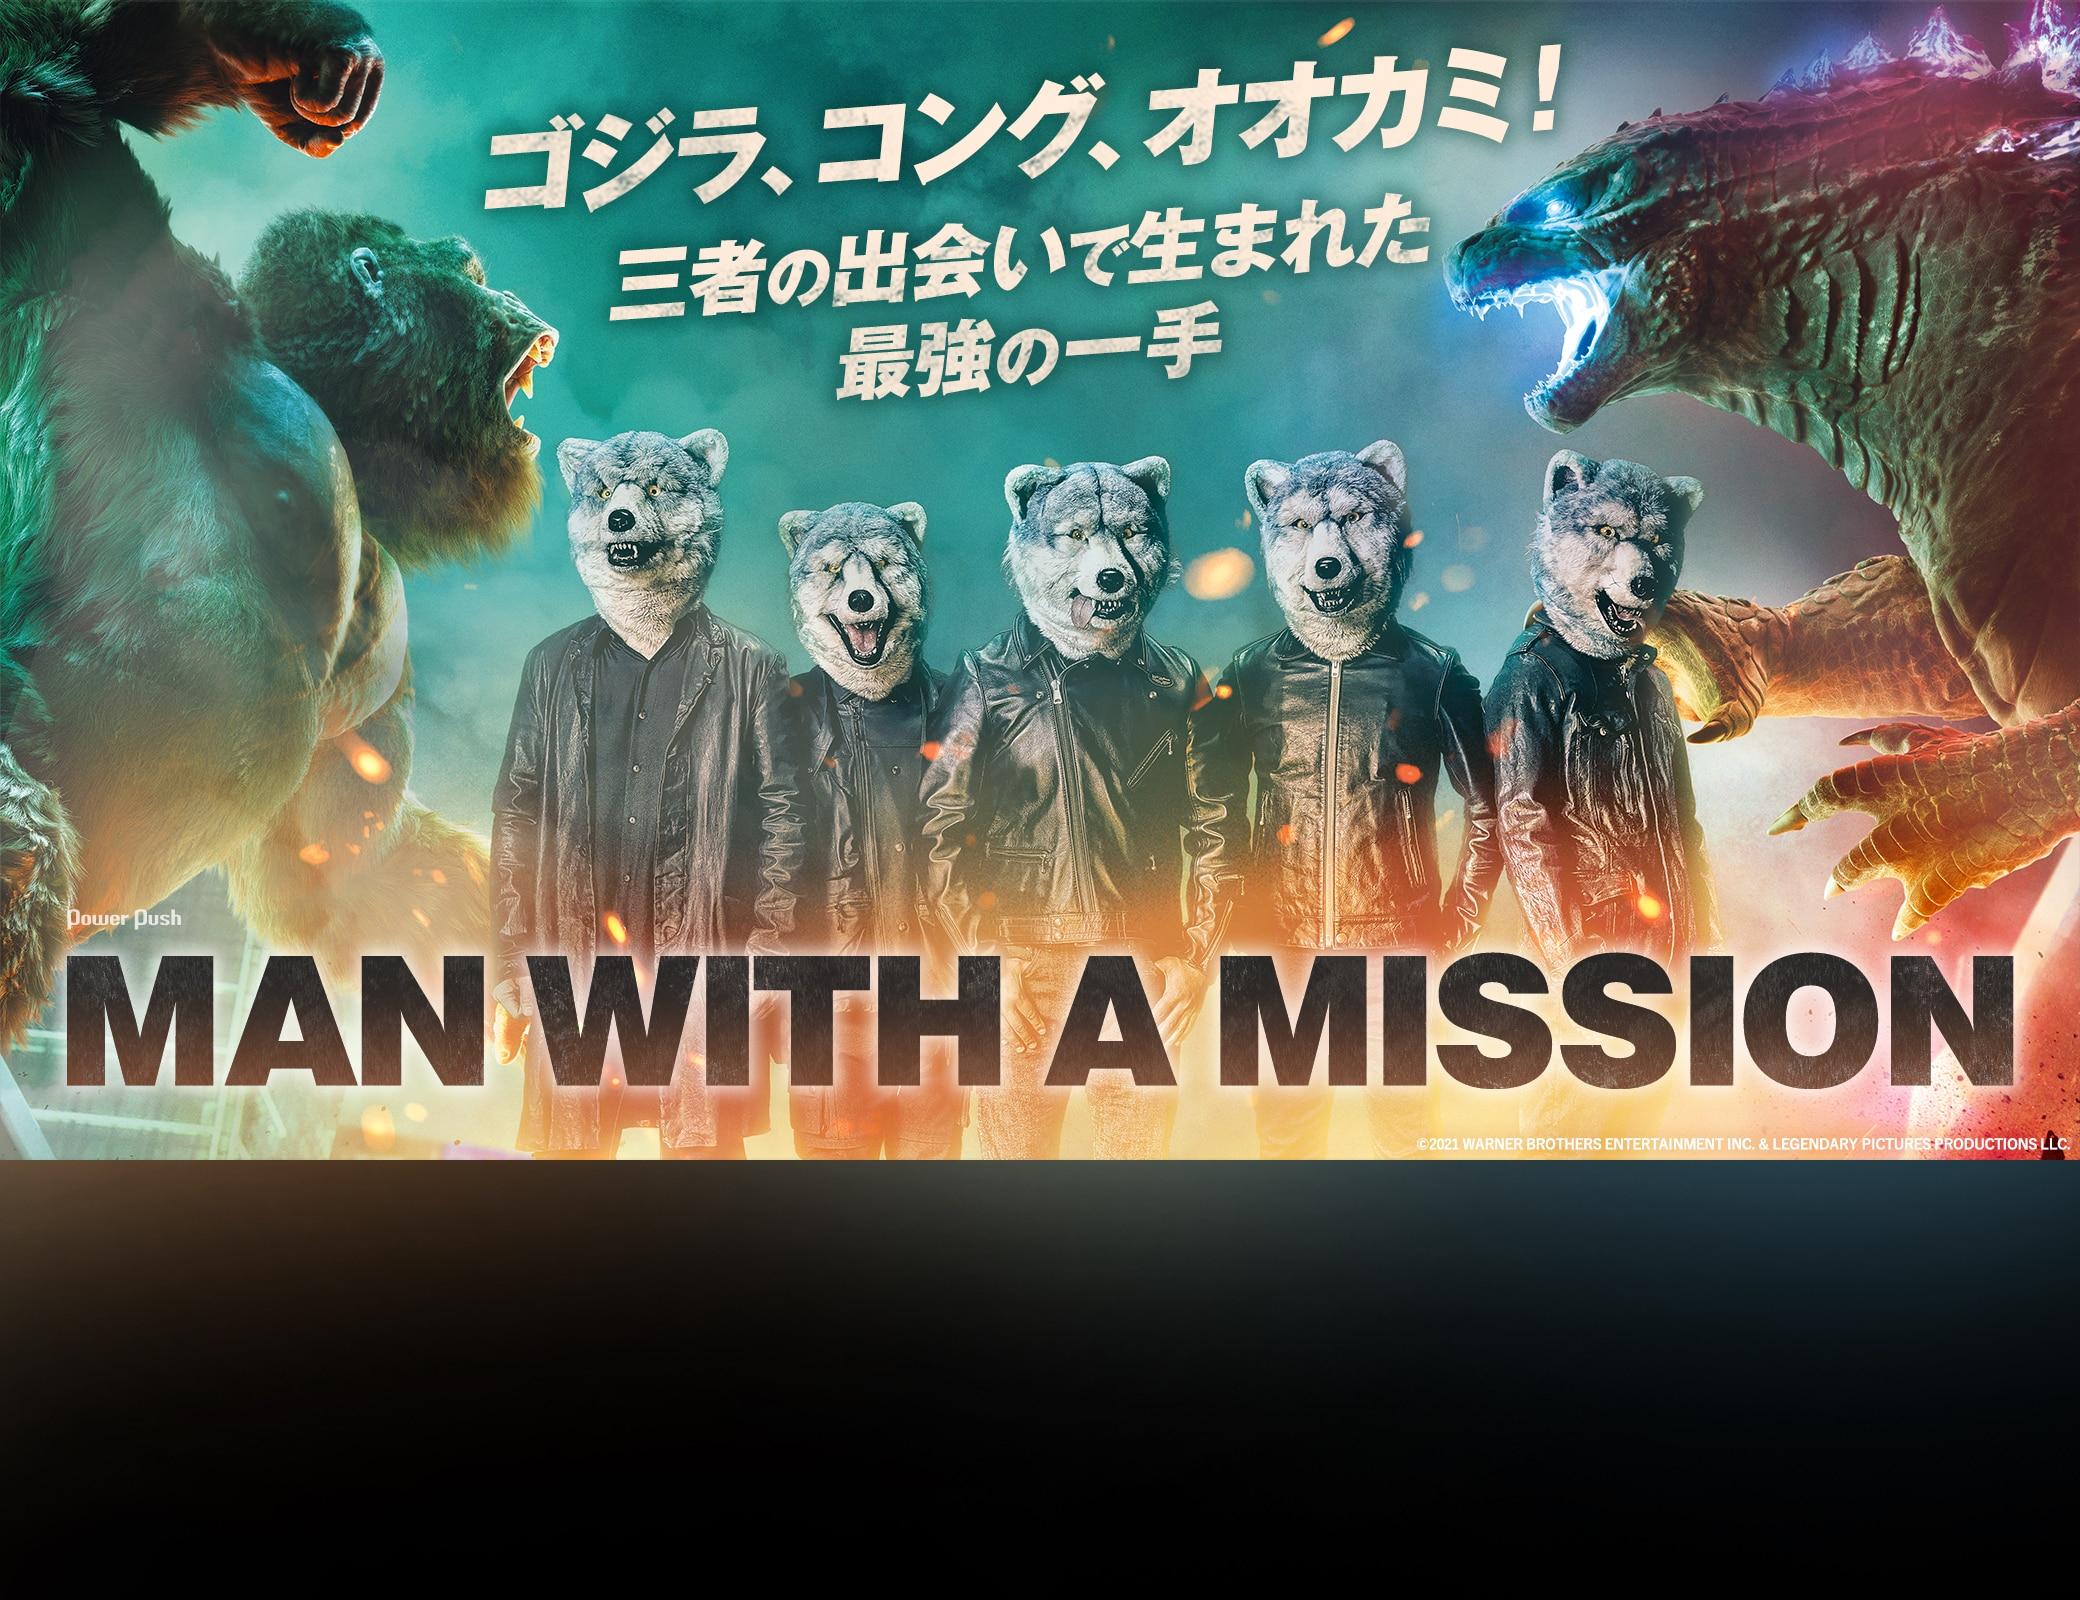 MAN WITH A MISSION|ゴジラ、コング、オオカミ!三者の出会いで生まれた最強の一手